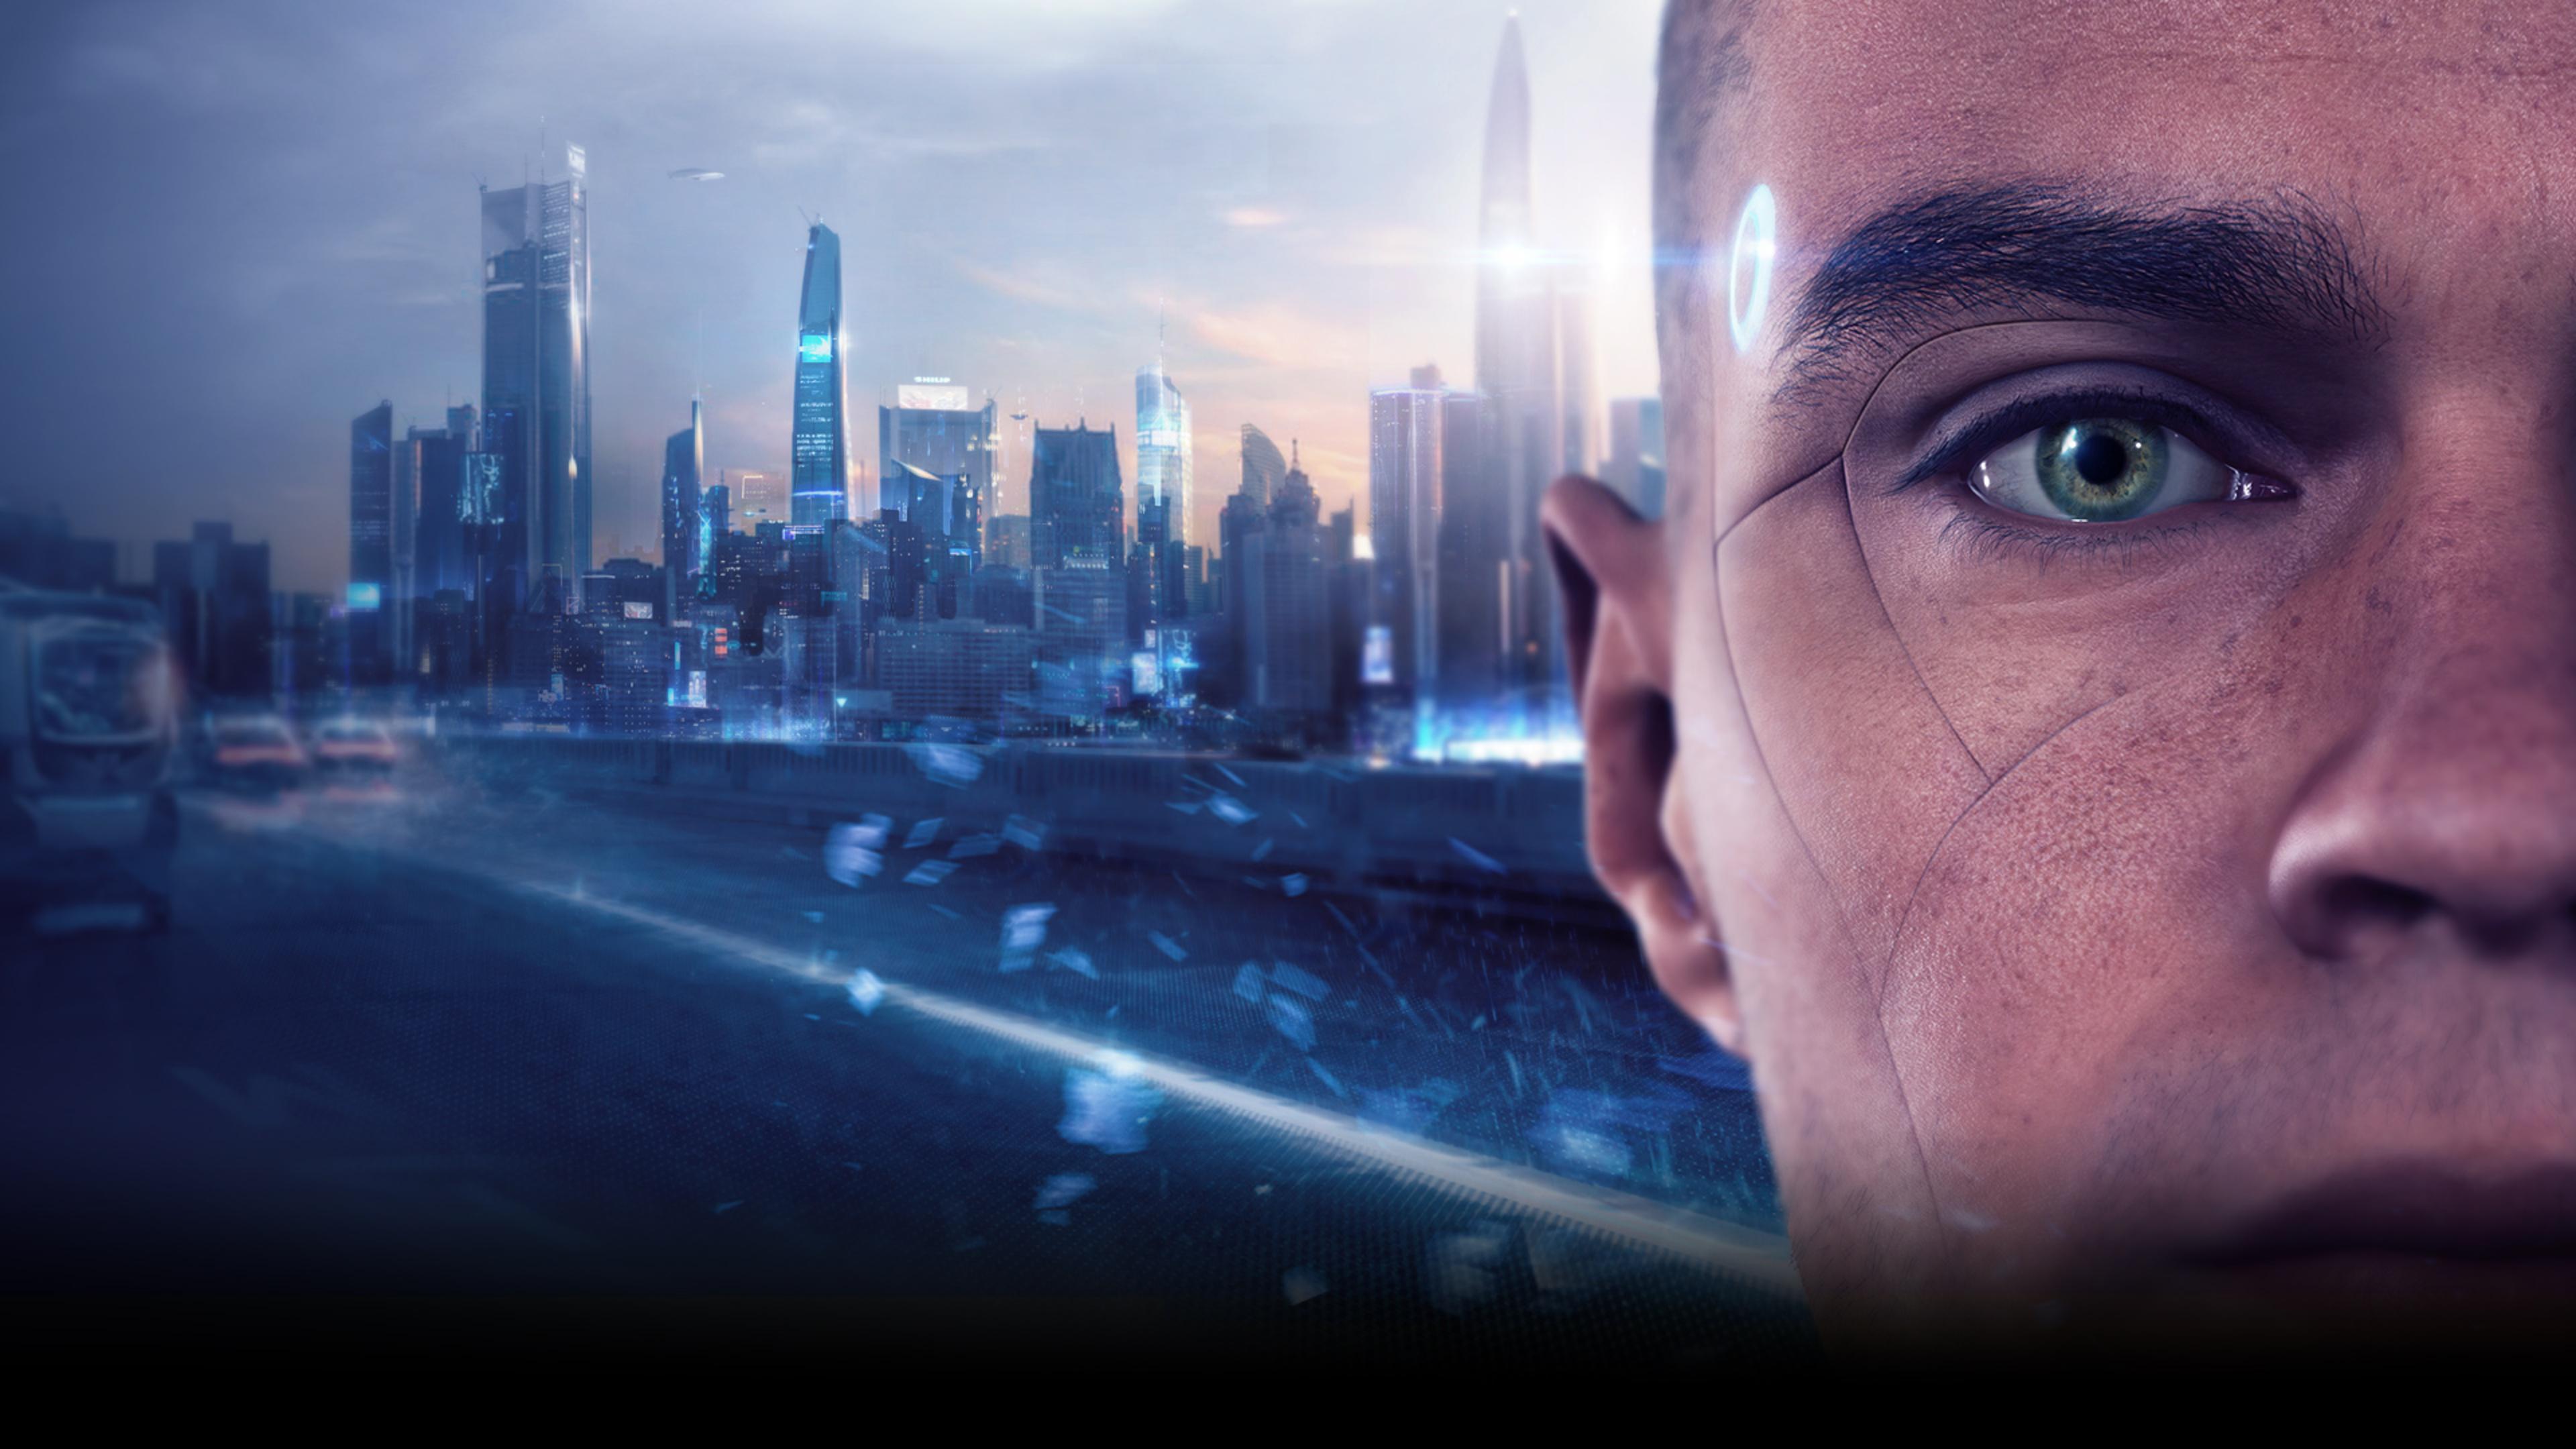 Detroit Become Human Hd Wallpaper: 3840x2160 Markus Detroit Become Human 2018 4k HD 4k